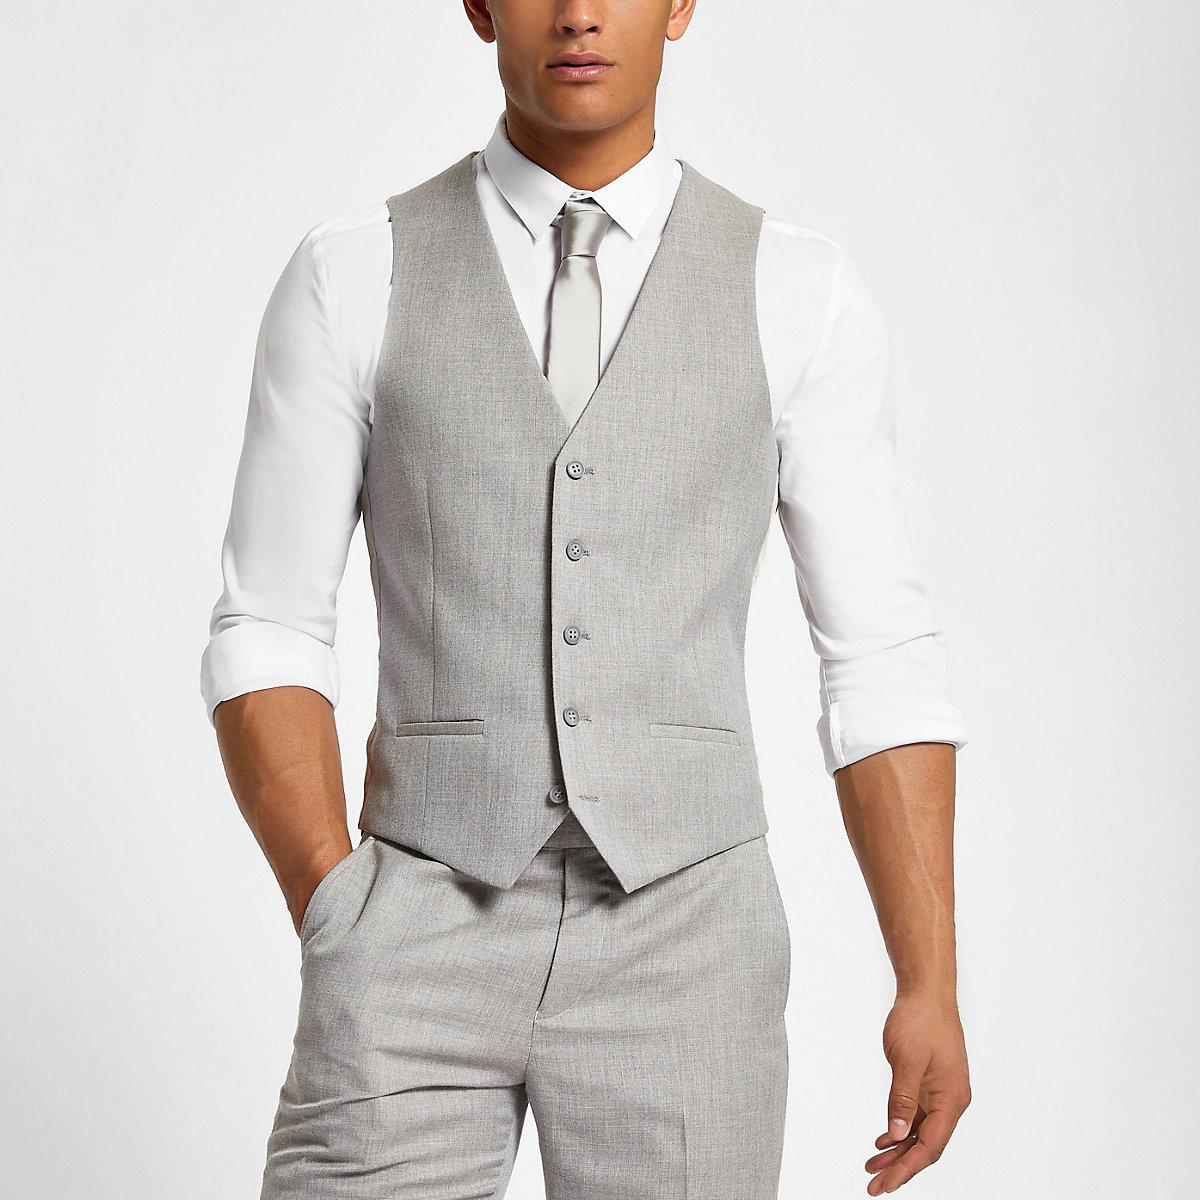 Light grey suit waistcoat